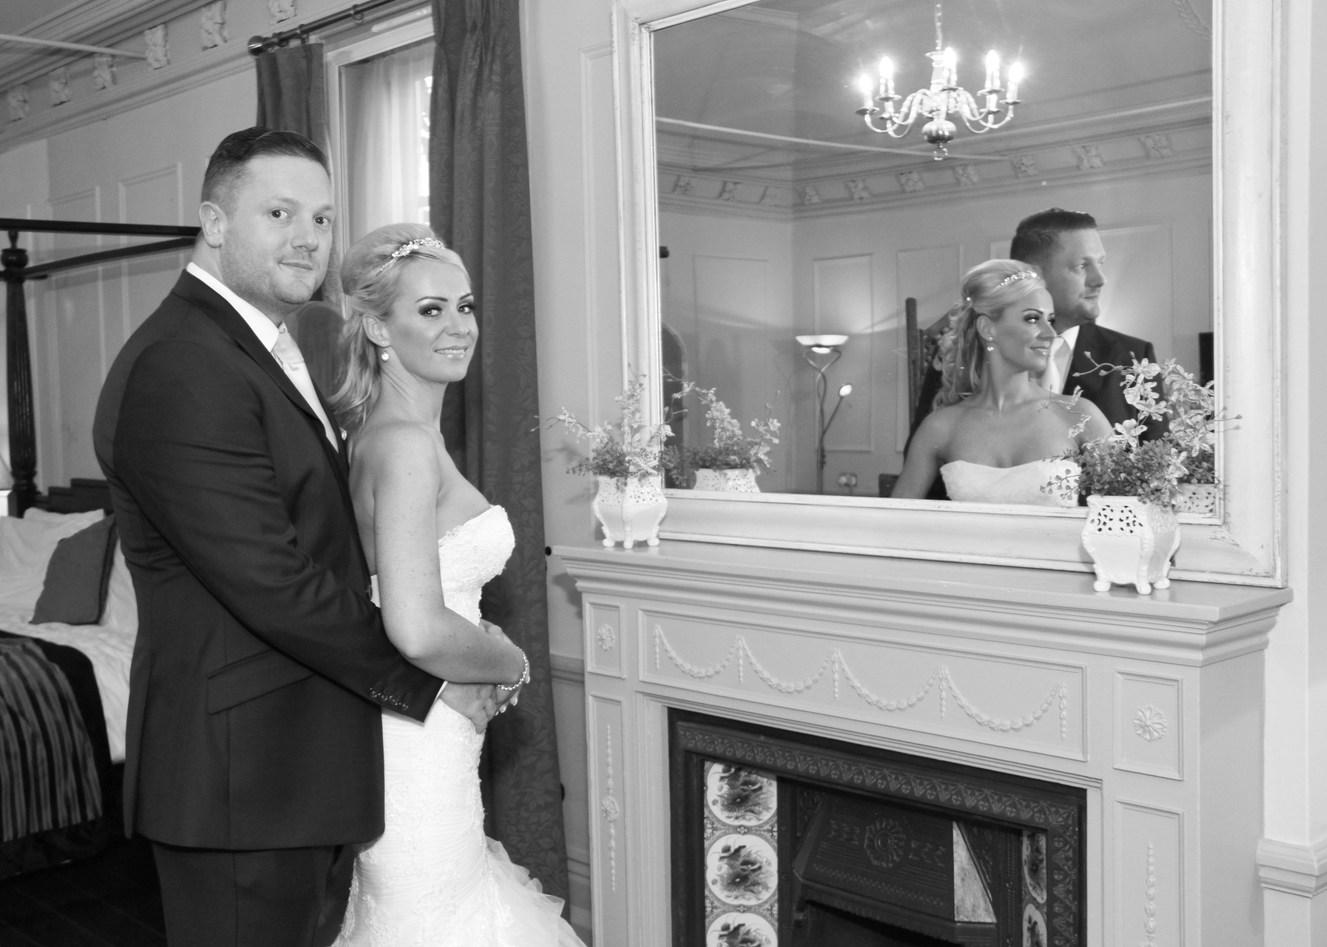 Chislehurst wedding photographer